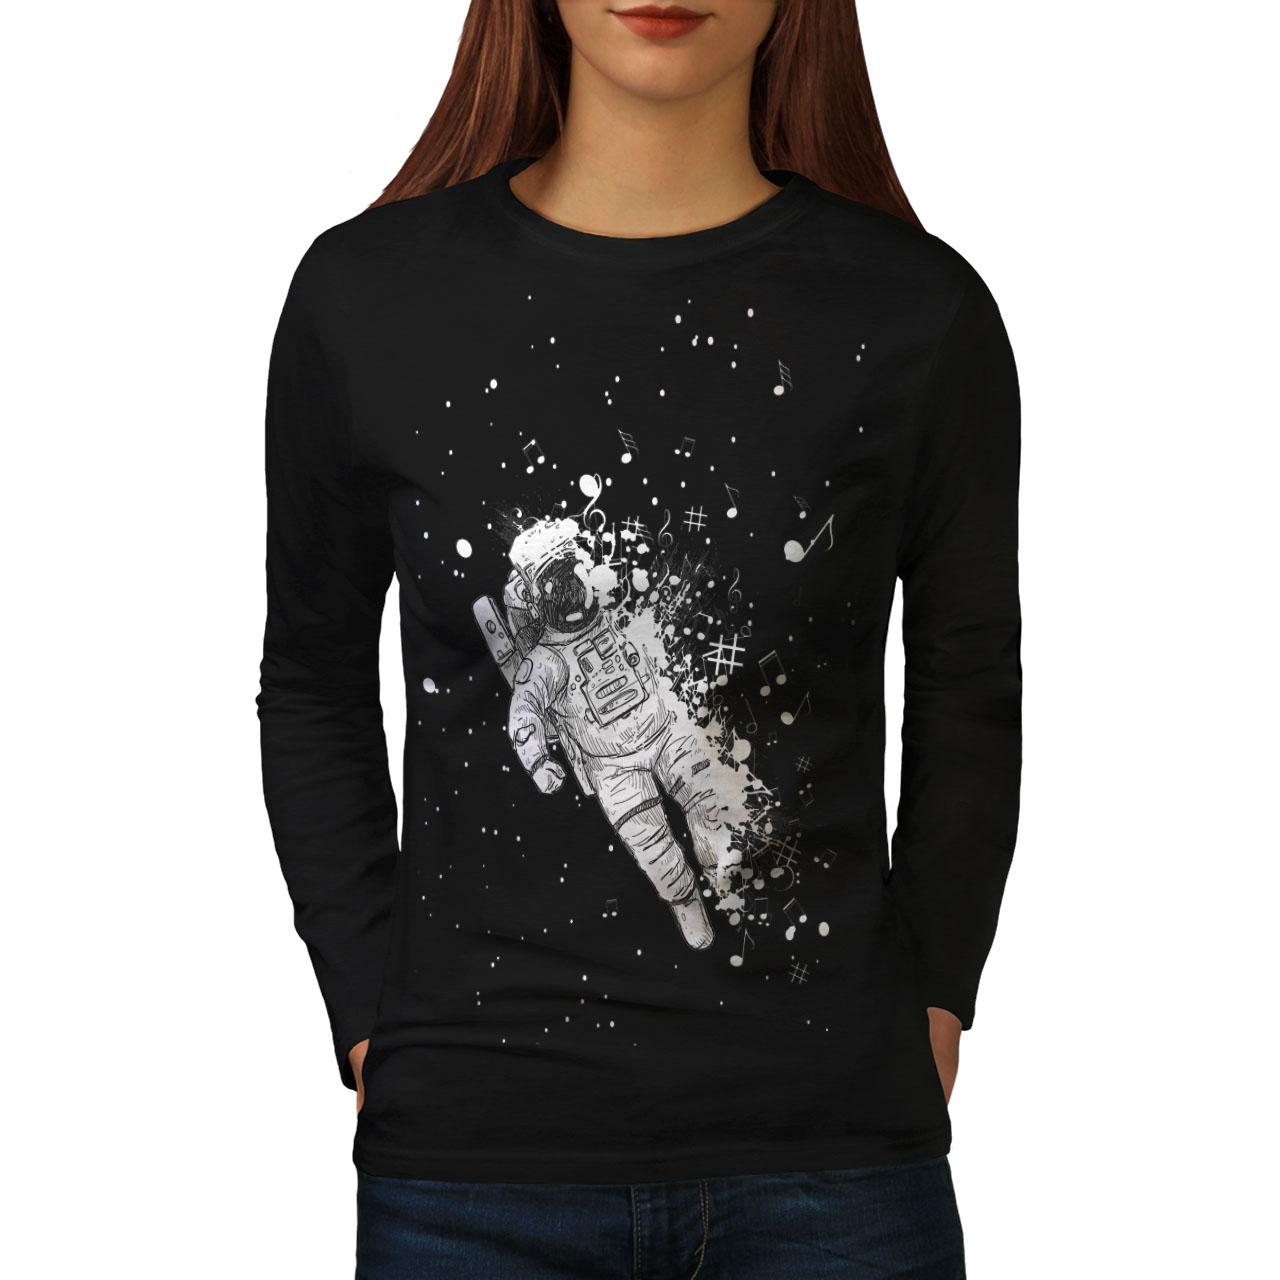 Evil Graphic Design Wellcoda Skull Astronaut Space Mens Long Sleeve T-shirt